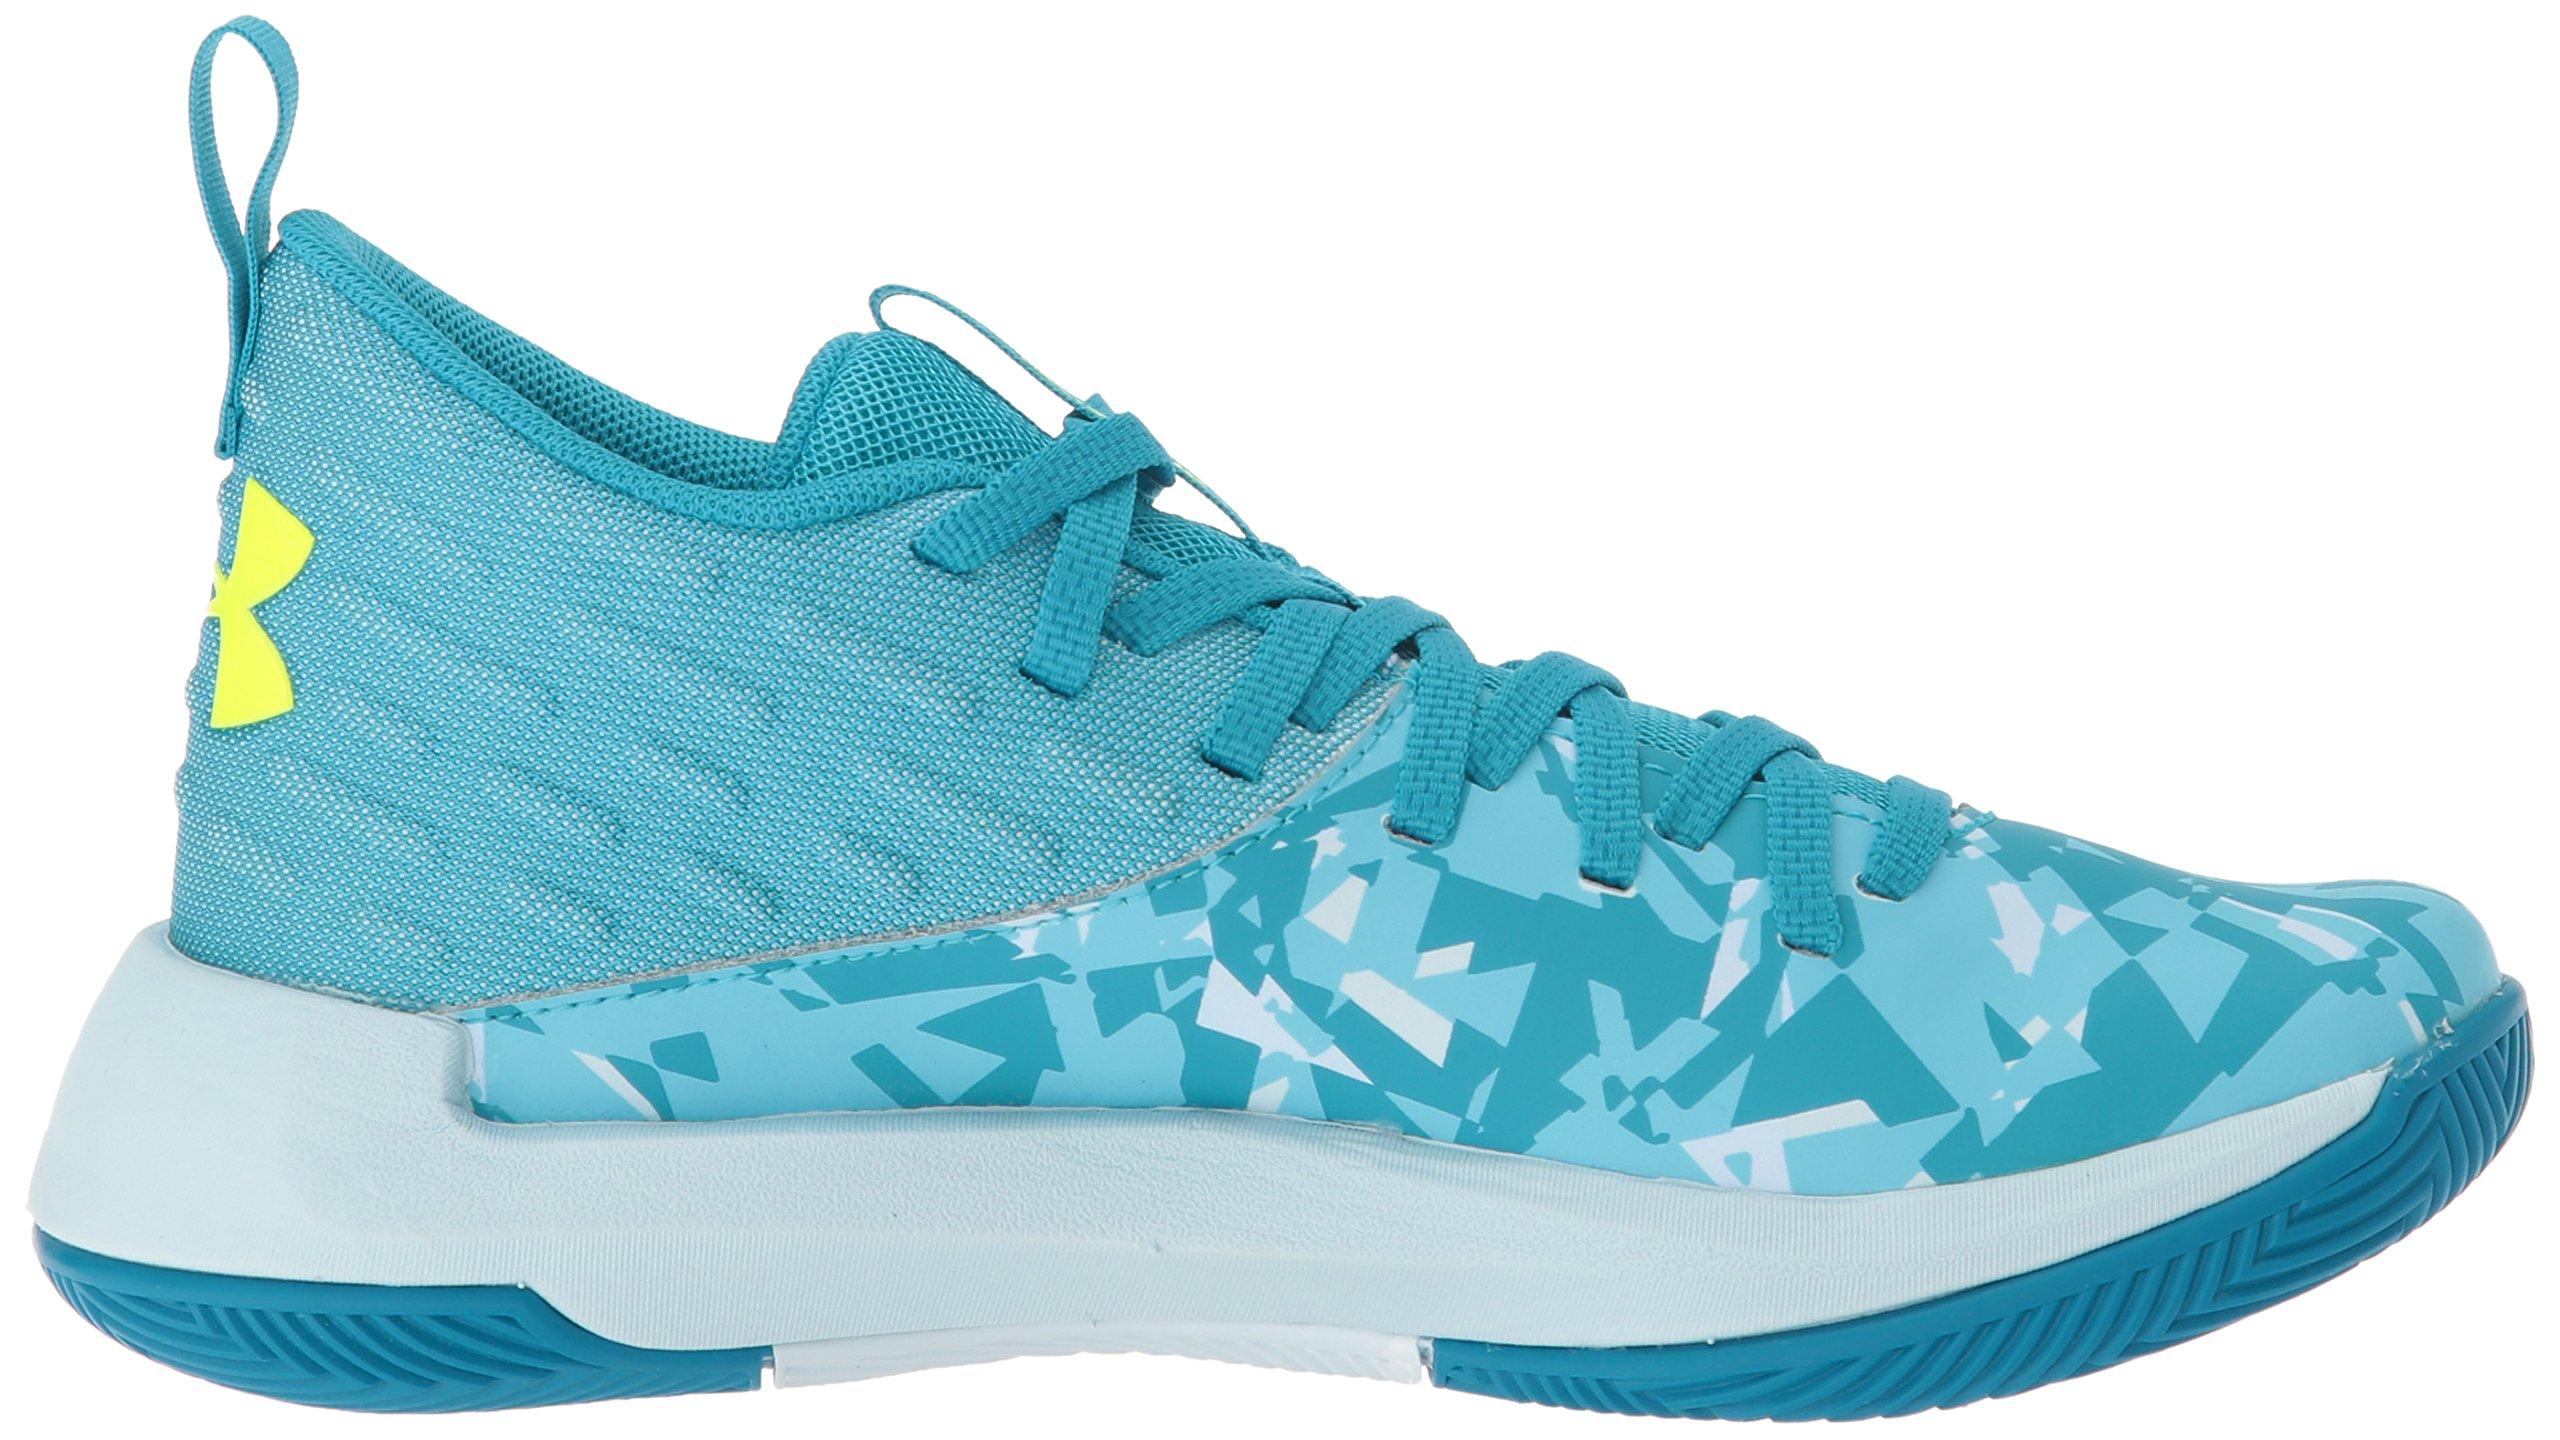 Under Armour Girls' Grade School Lightning 5 Basketball Shoe, Deceit (300)/Halogen Blue, 5.5 by Under Armour (Image #6)